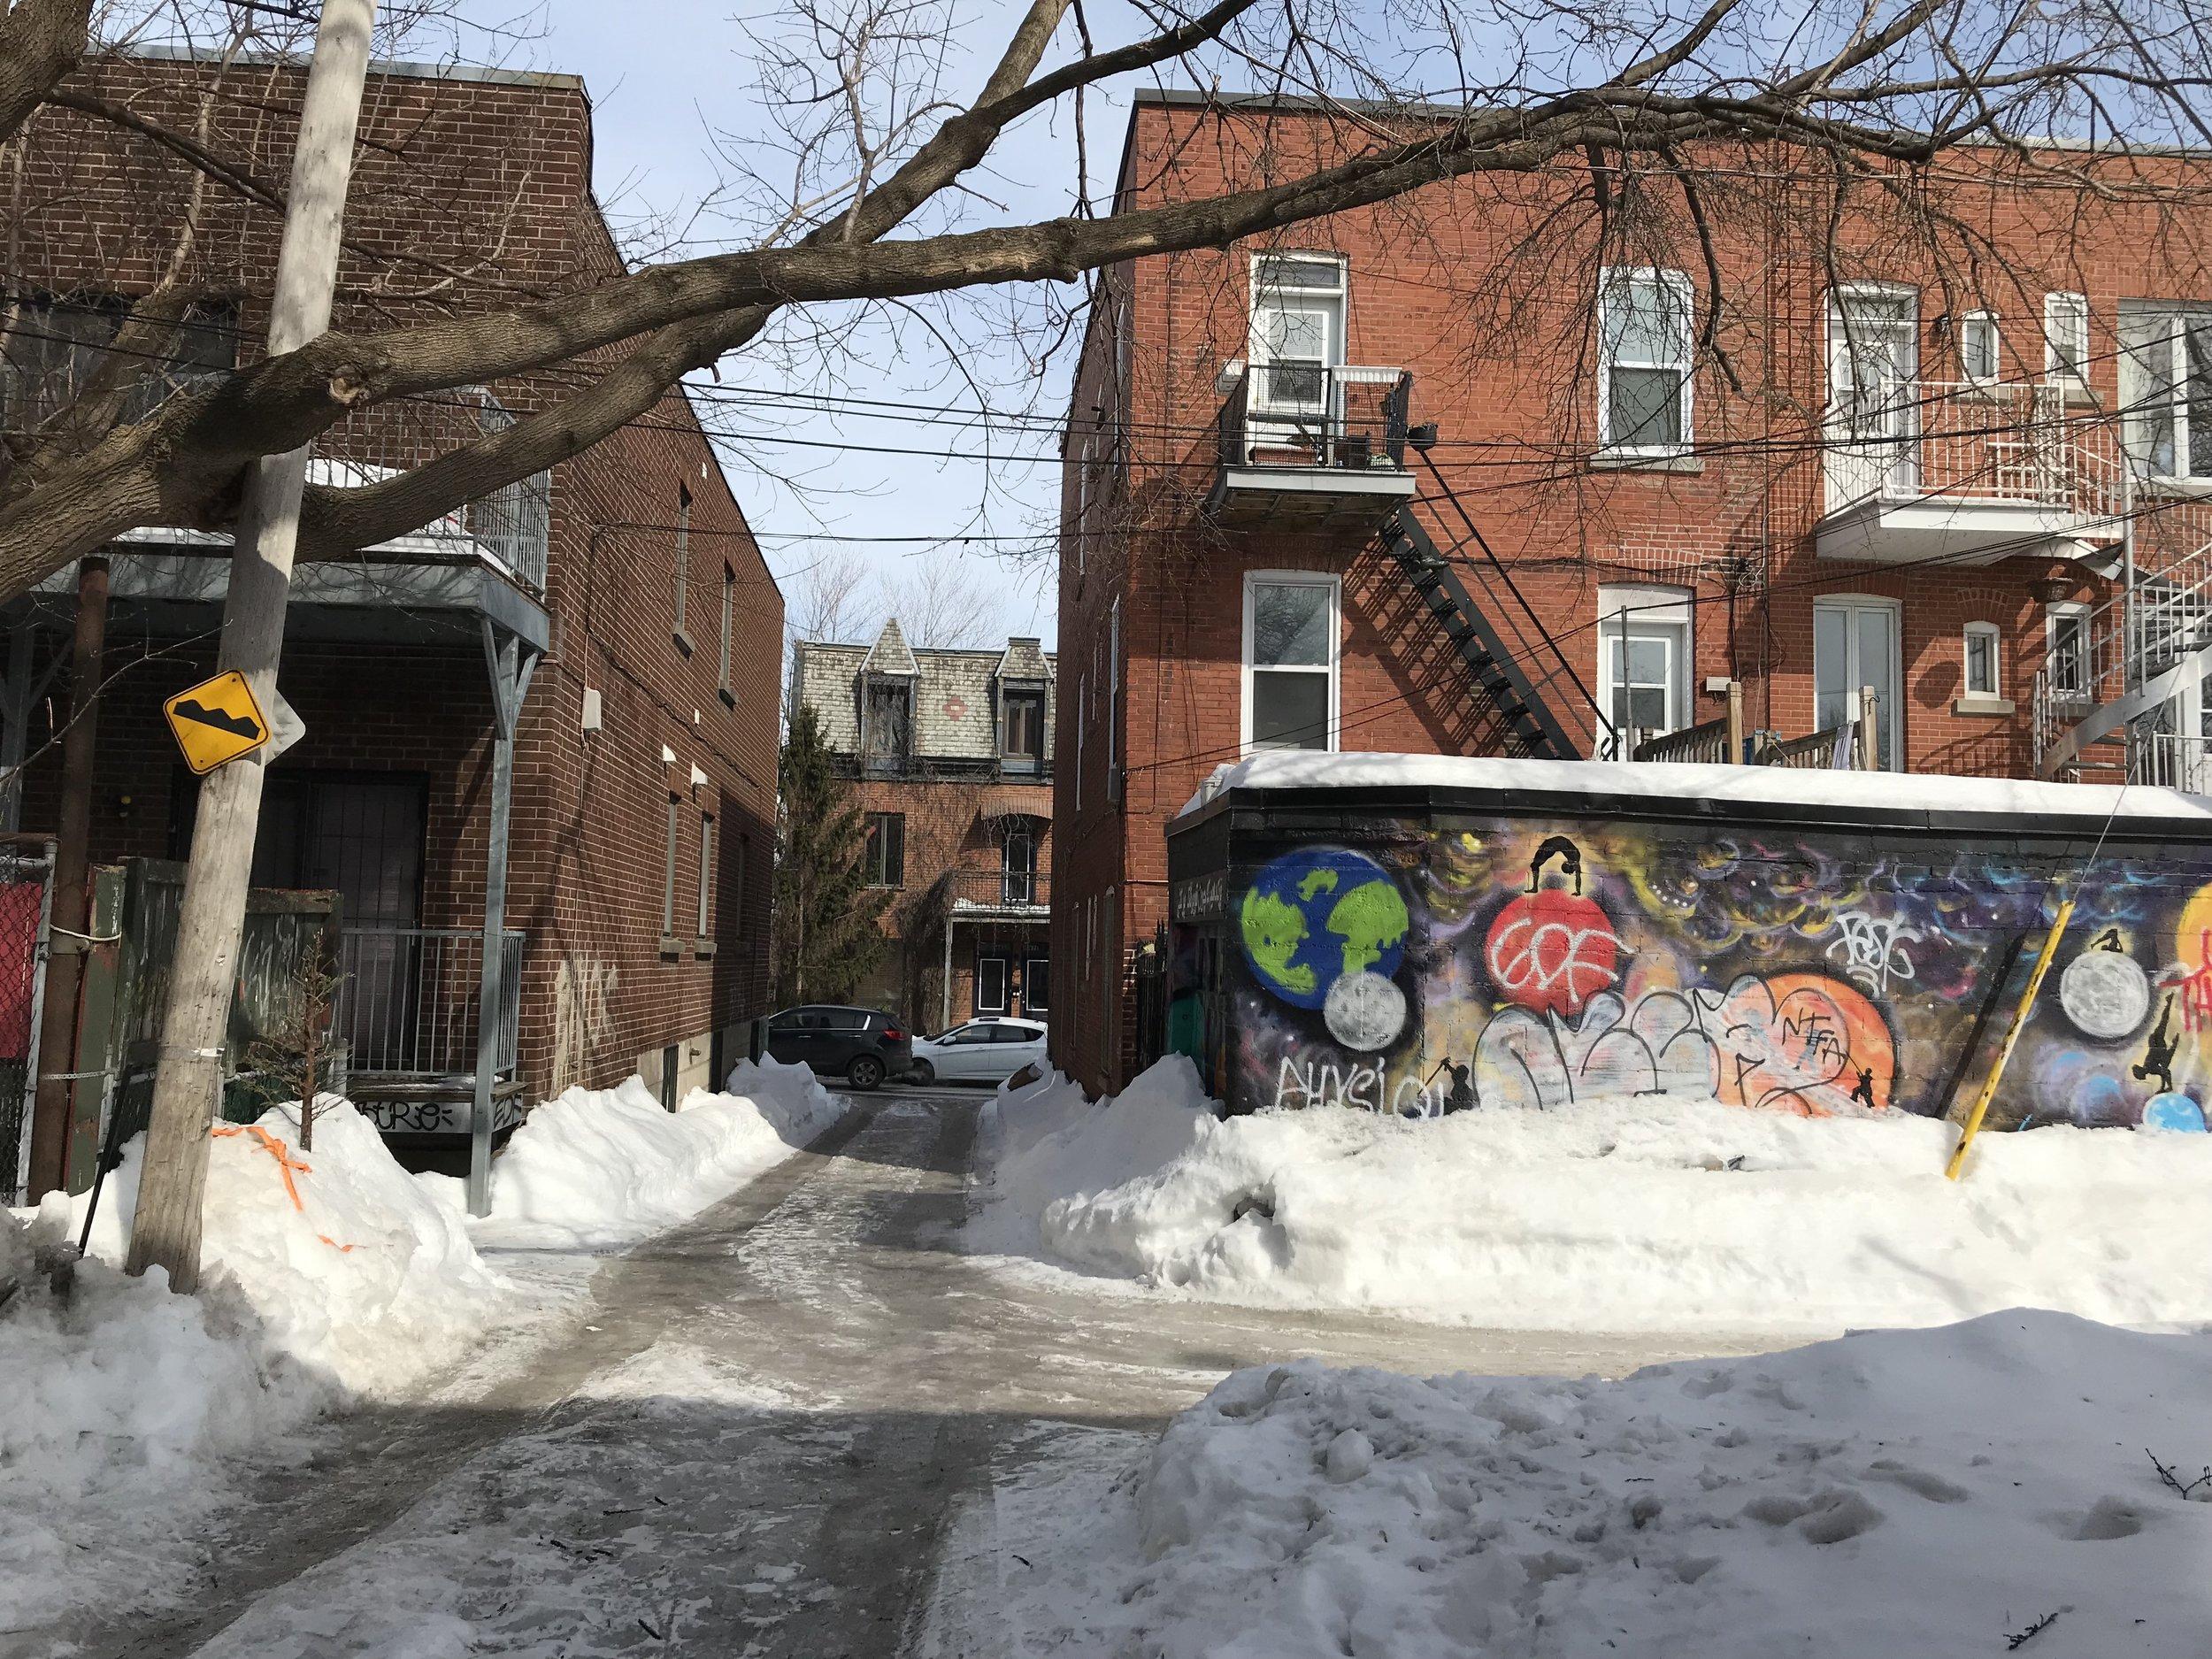 Alley artwork